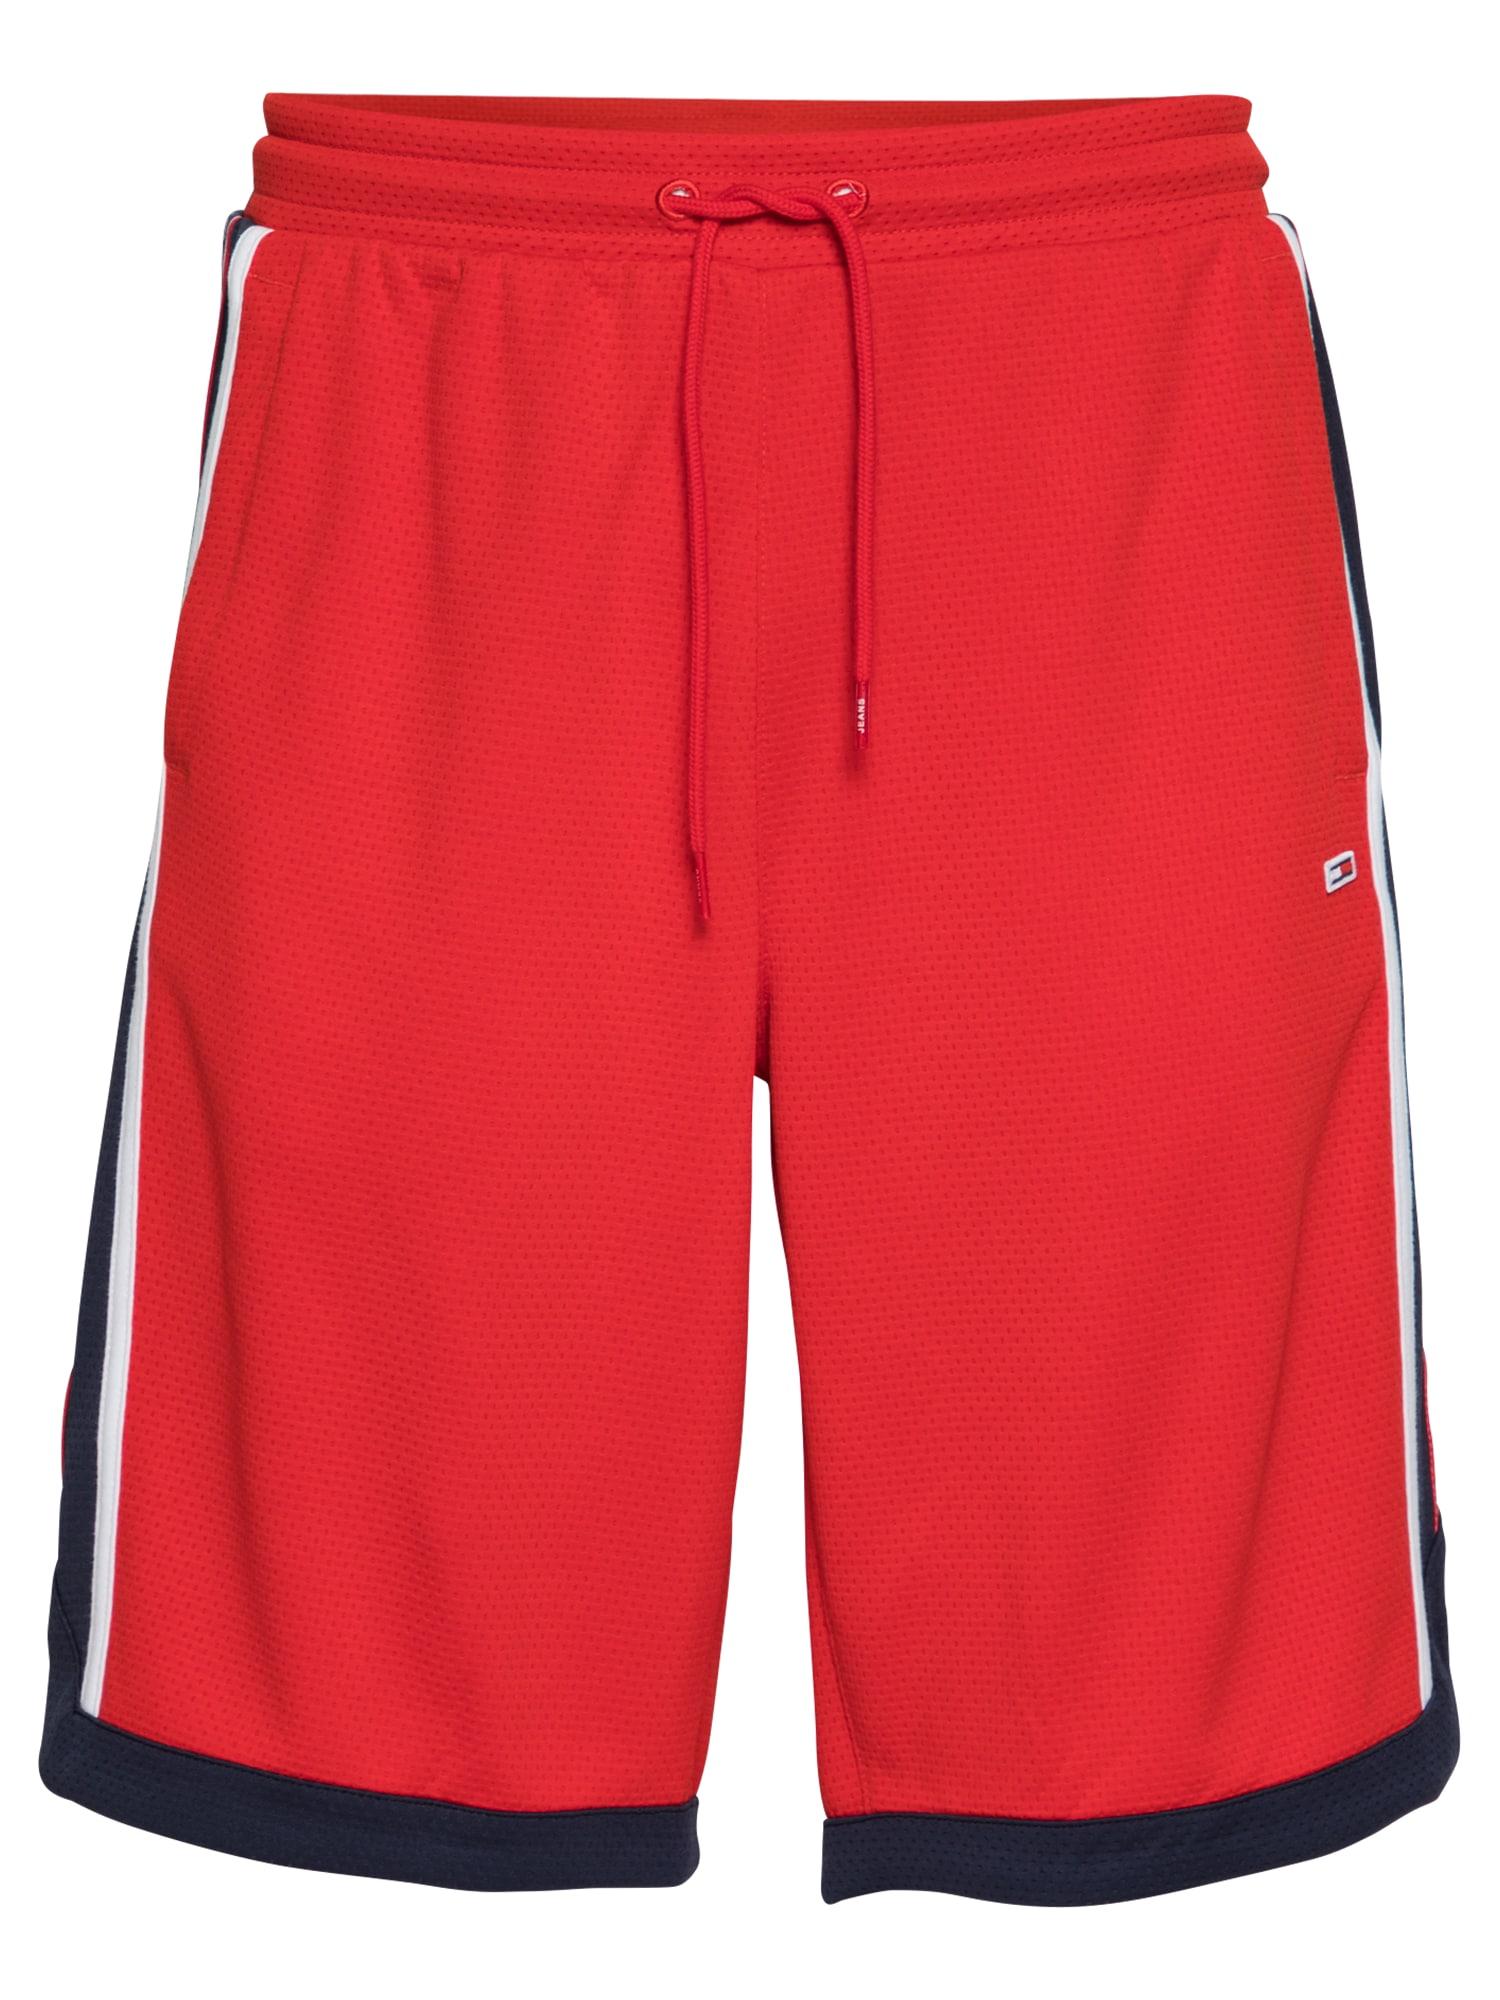 Tommy Jeans Kelnės raudona / tamsiai mėlyna jūros spalva / balta